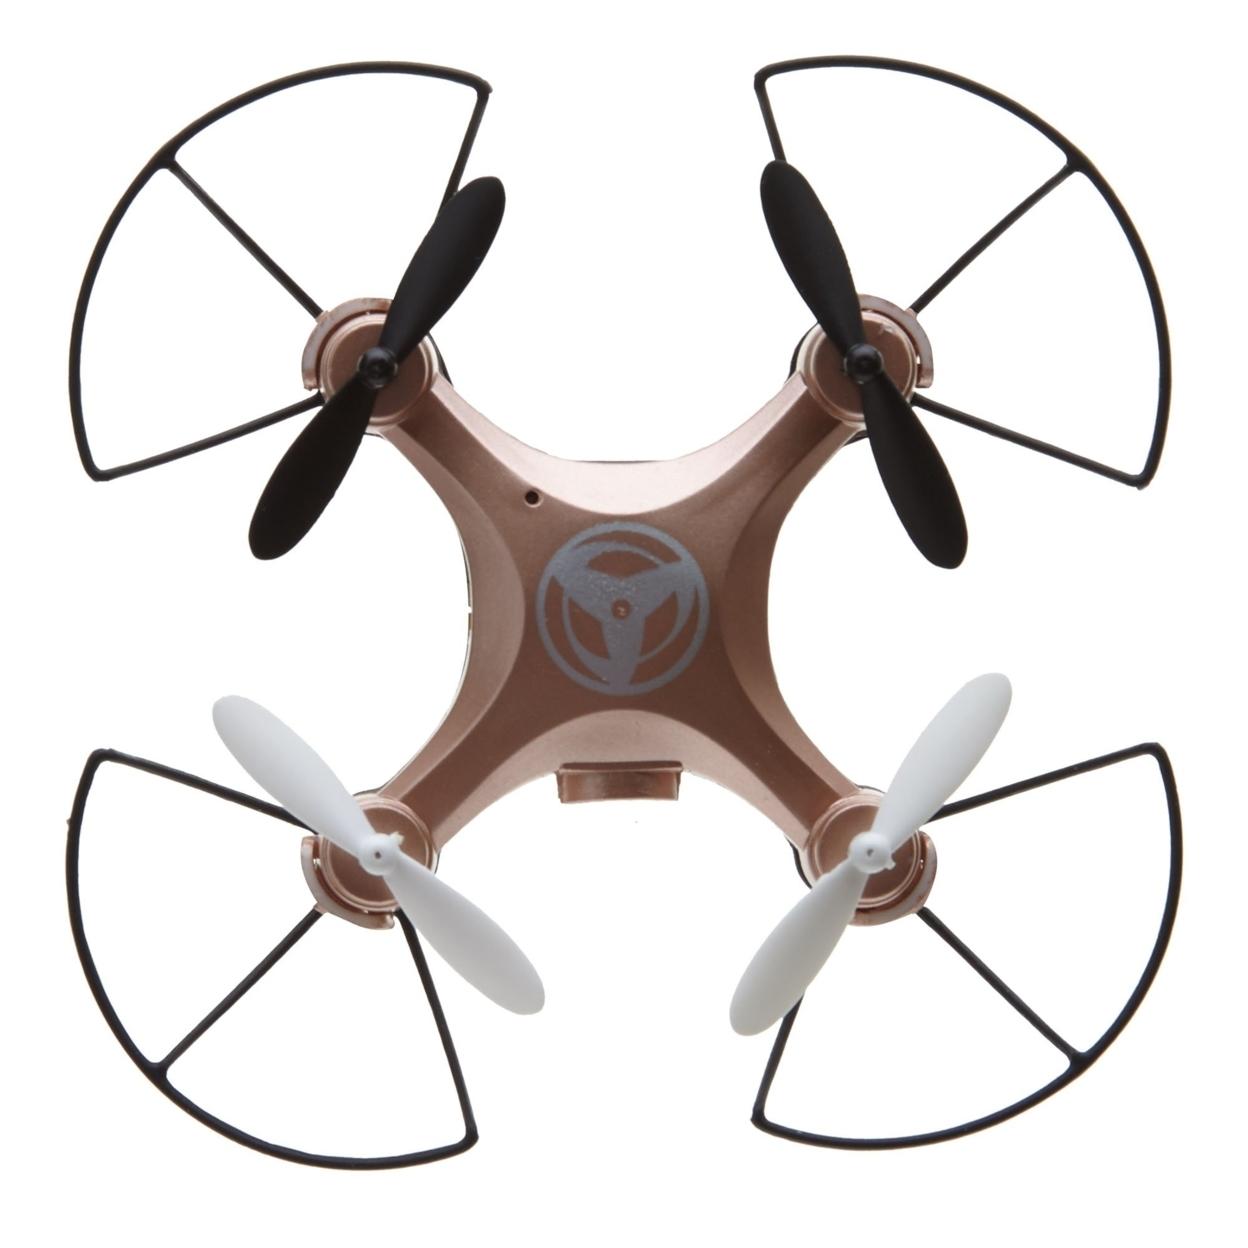 Air America Drone Mini Drone 5a384b132a00e444193176b8